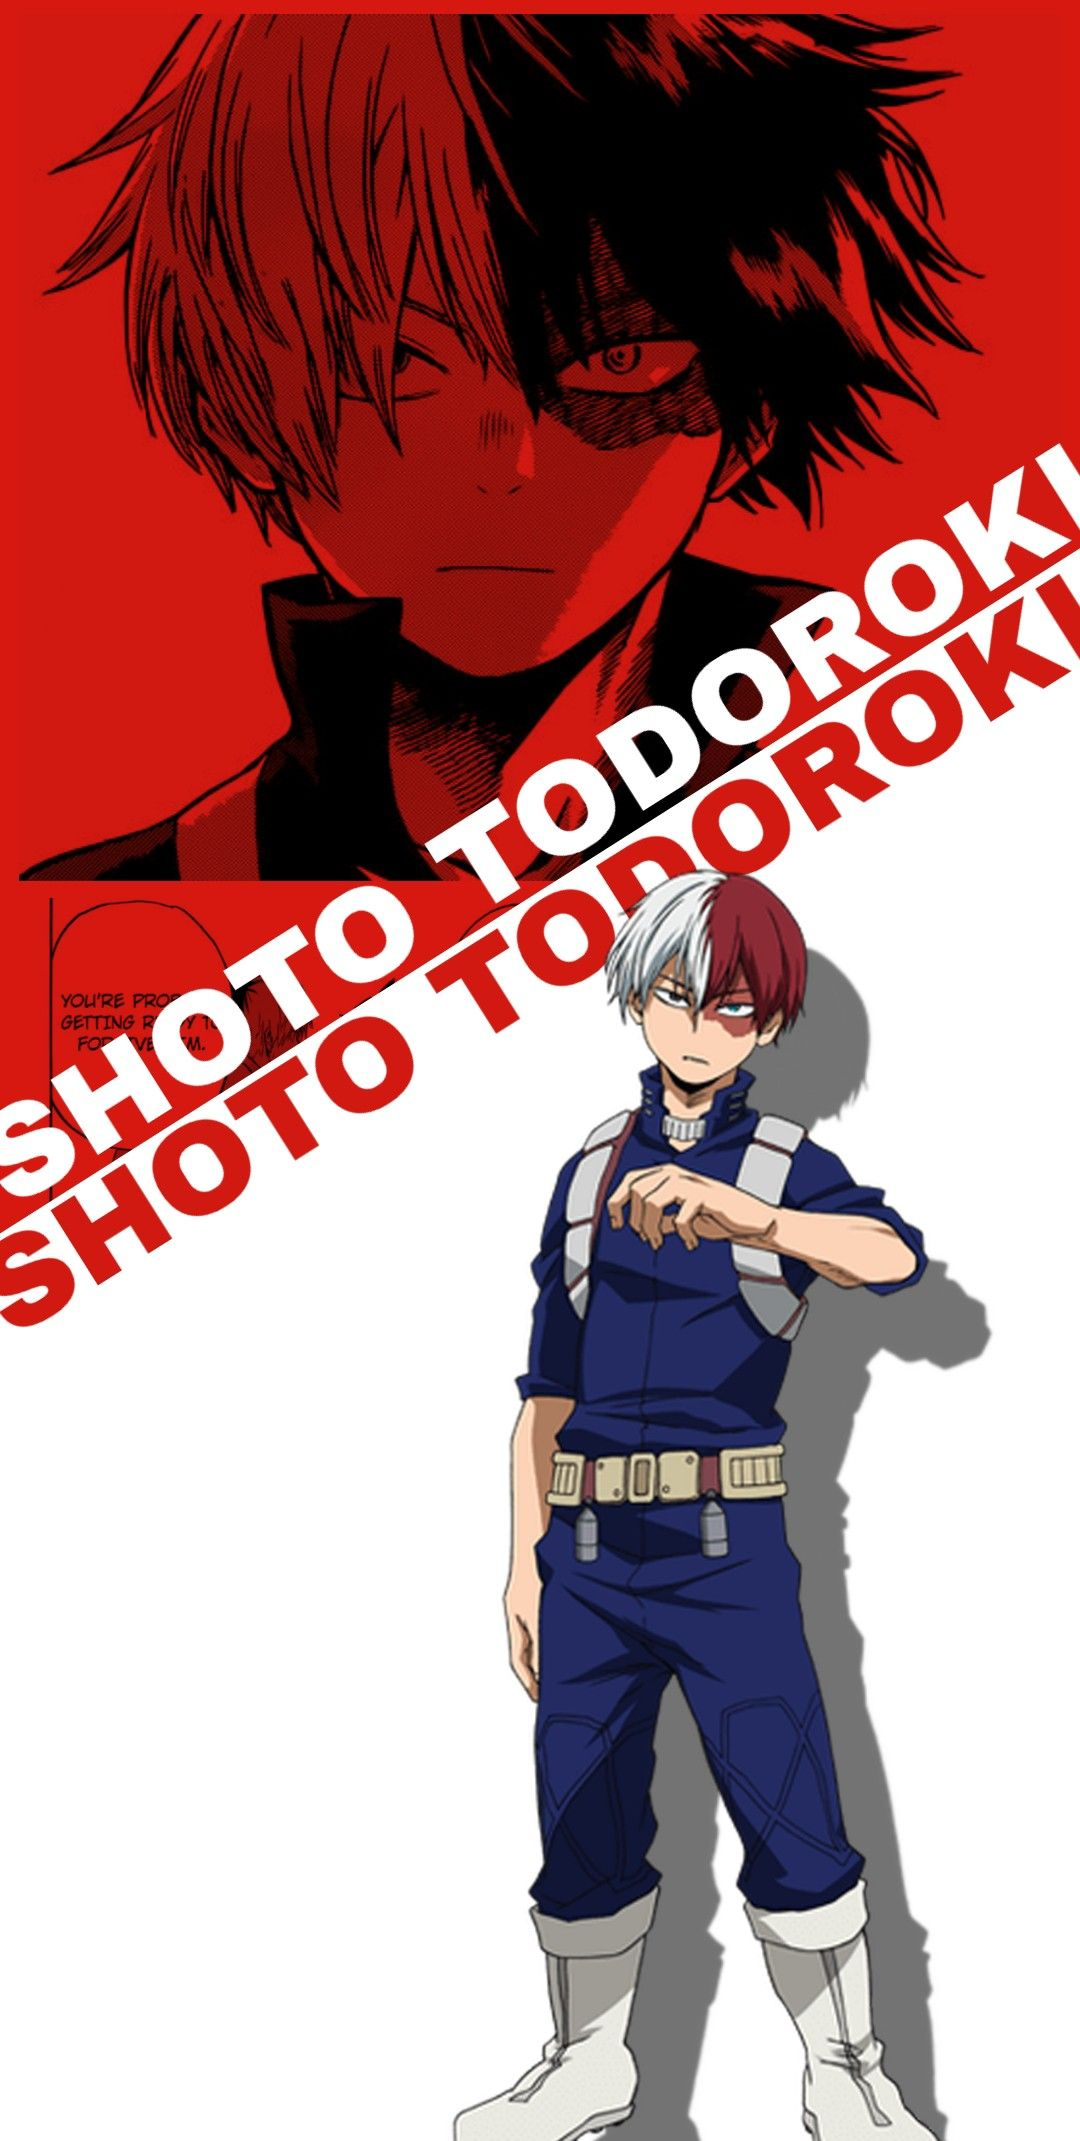 Shoto Todoroki Wallpaper Hero Wallpaper Cute Anime Wallpaper Anime Boyfriend